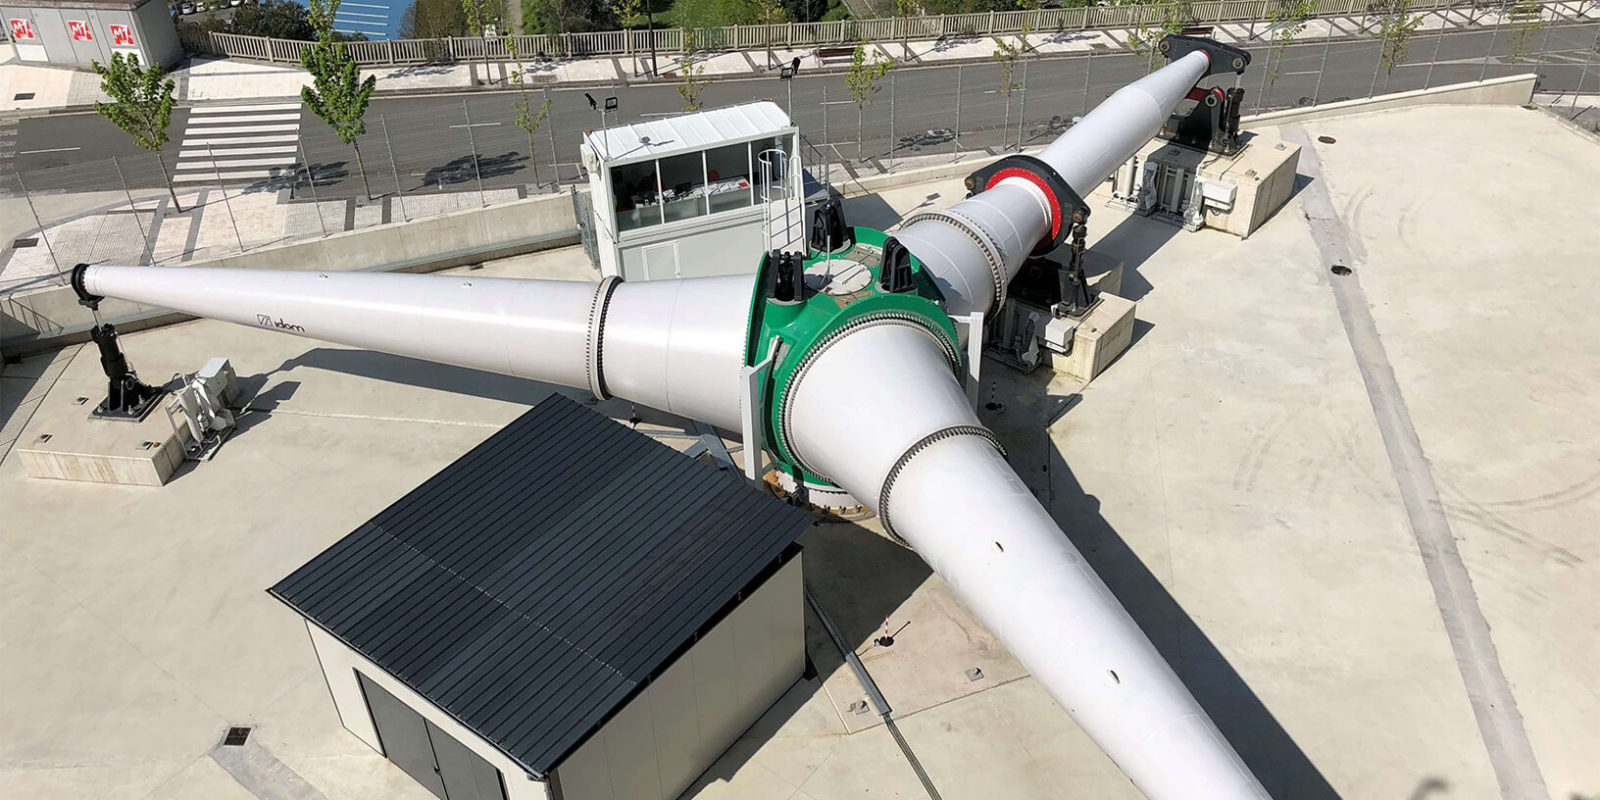 Windbox_Test_bench_wind_energy_hub_blade_bearing_©_IDOM_ADA (4)